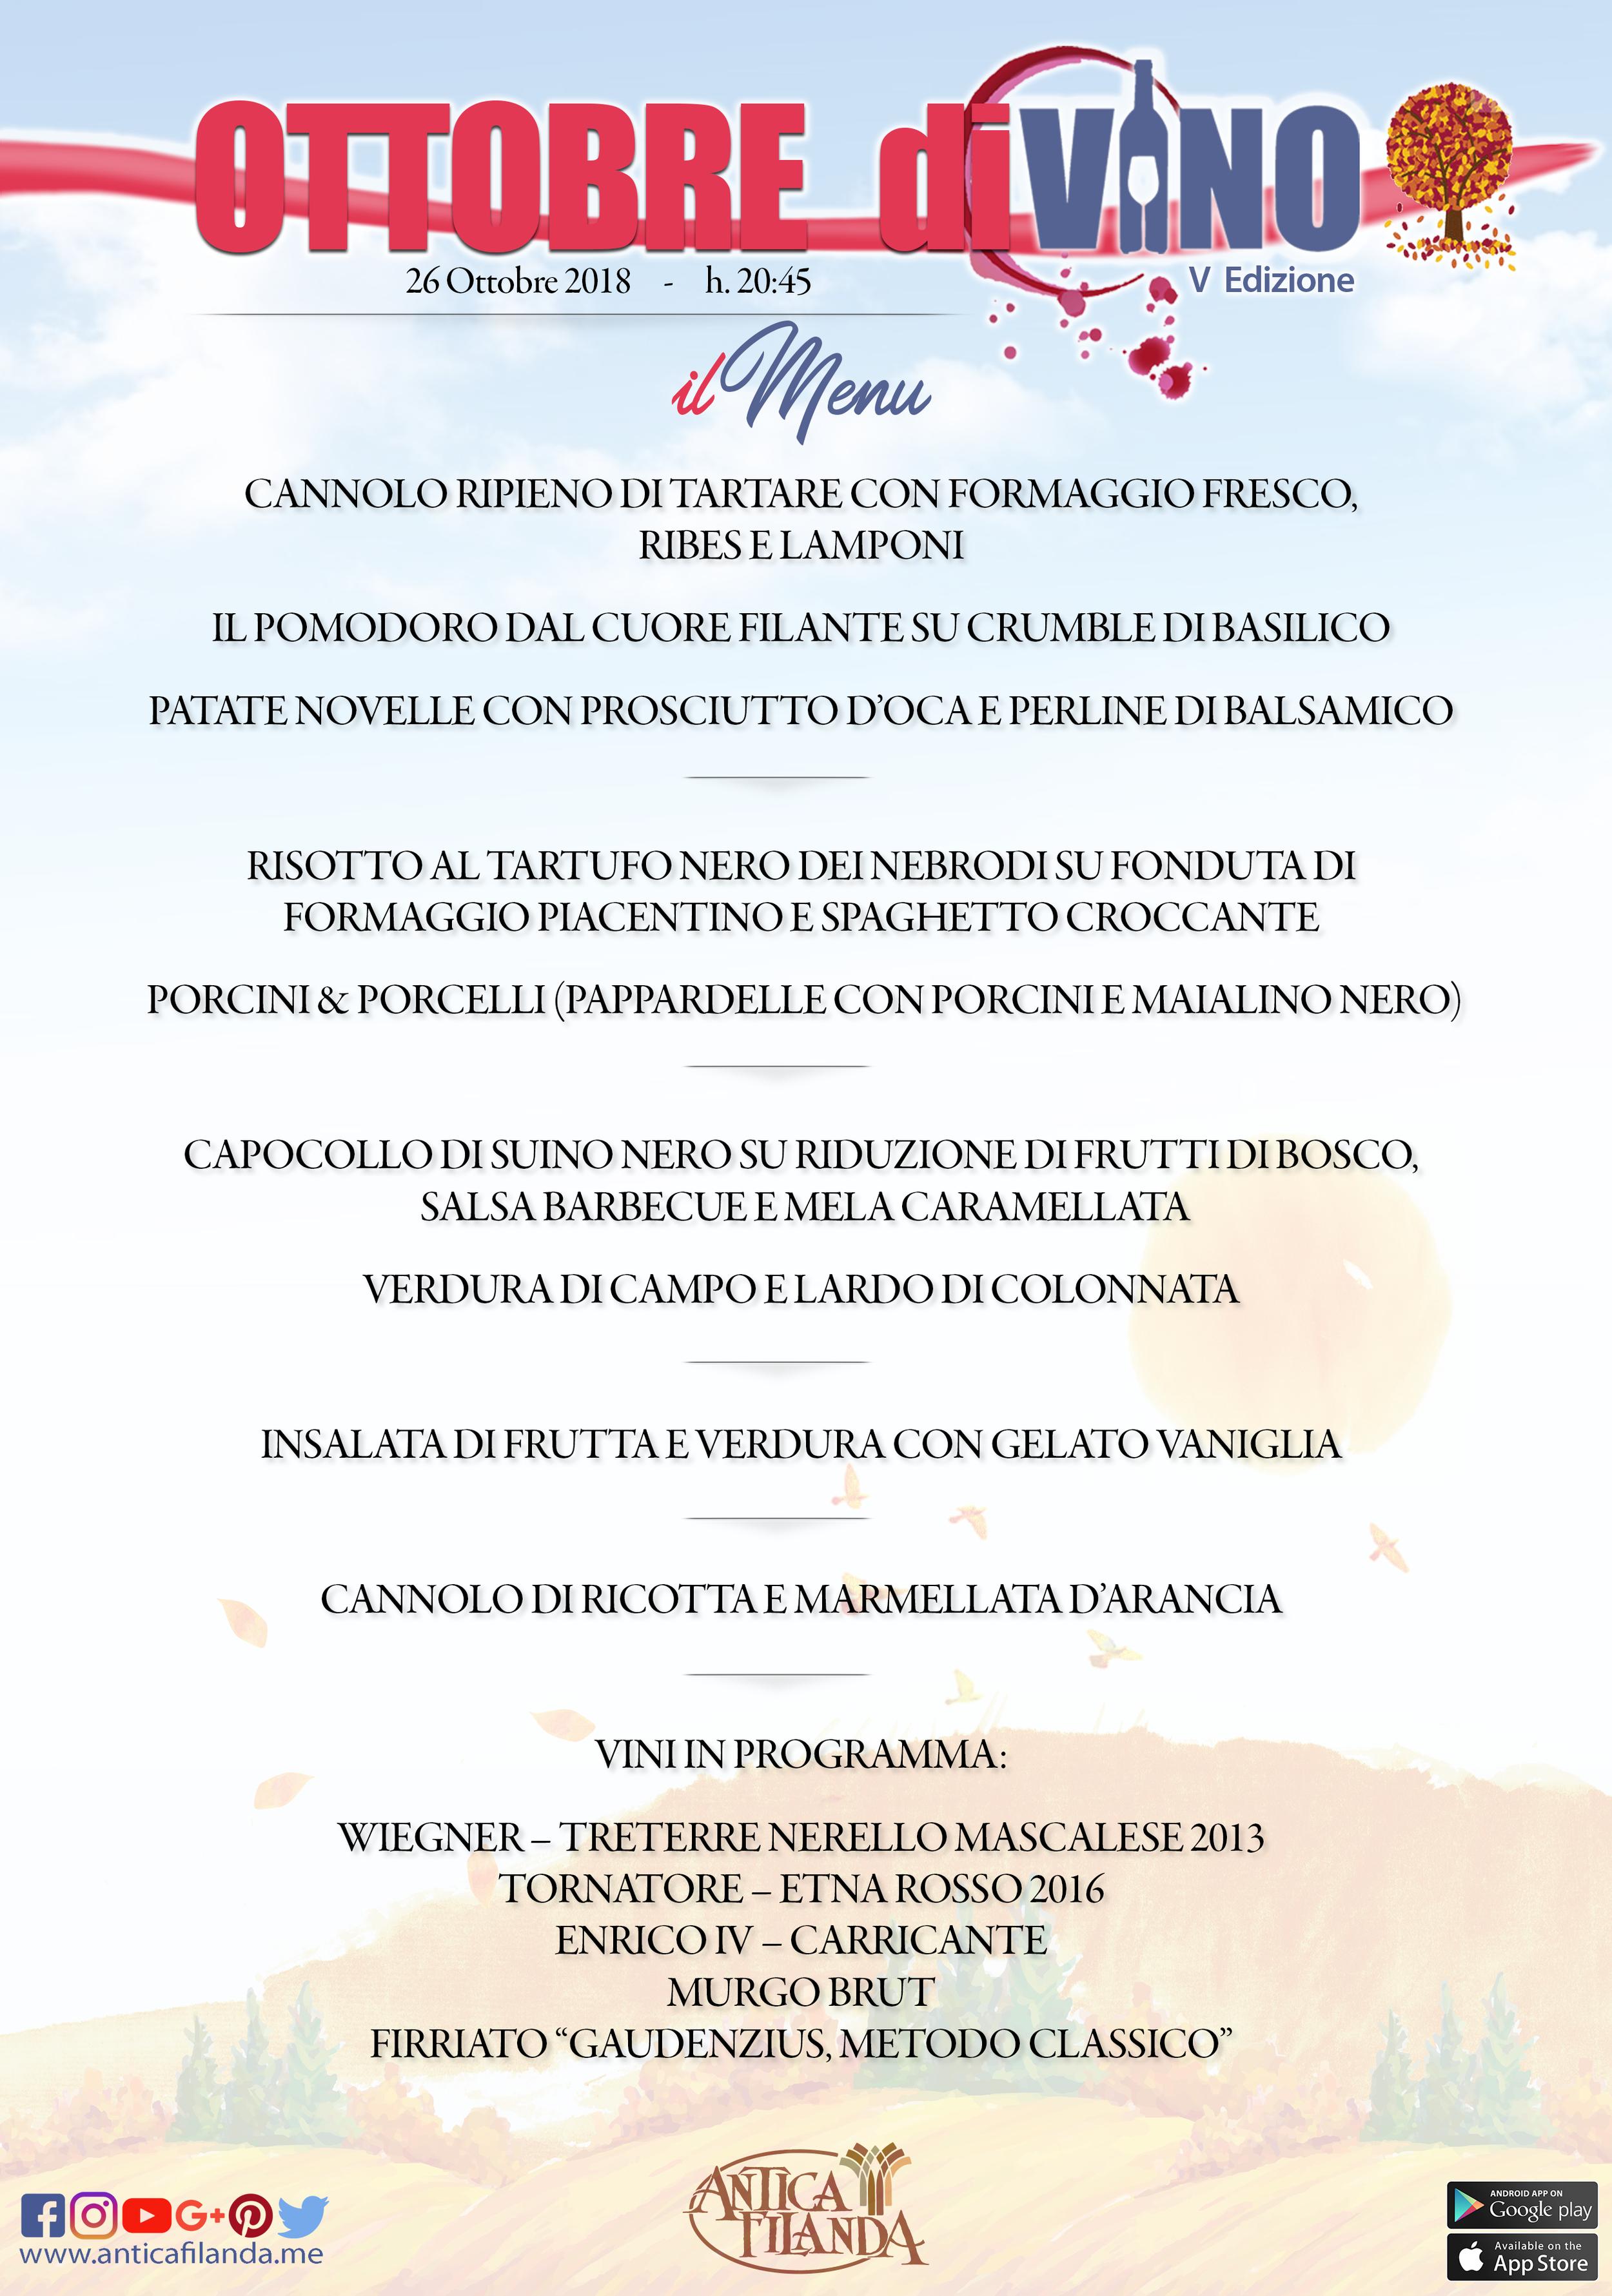 menu ottobre divino 5 edizione